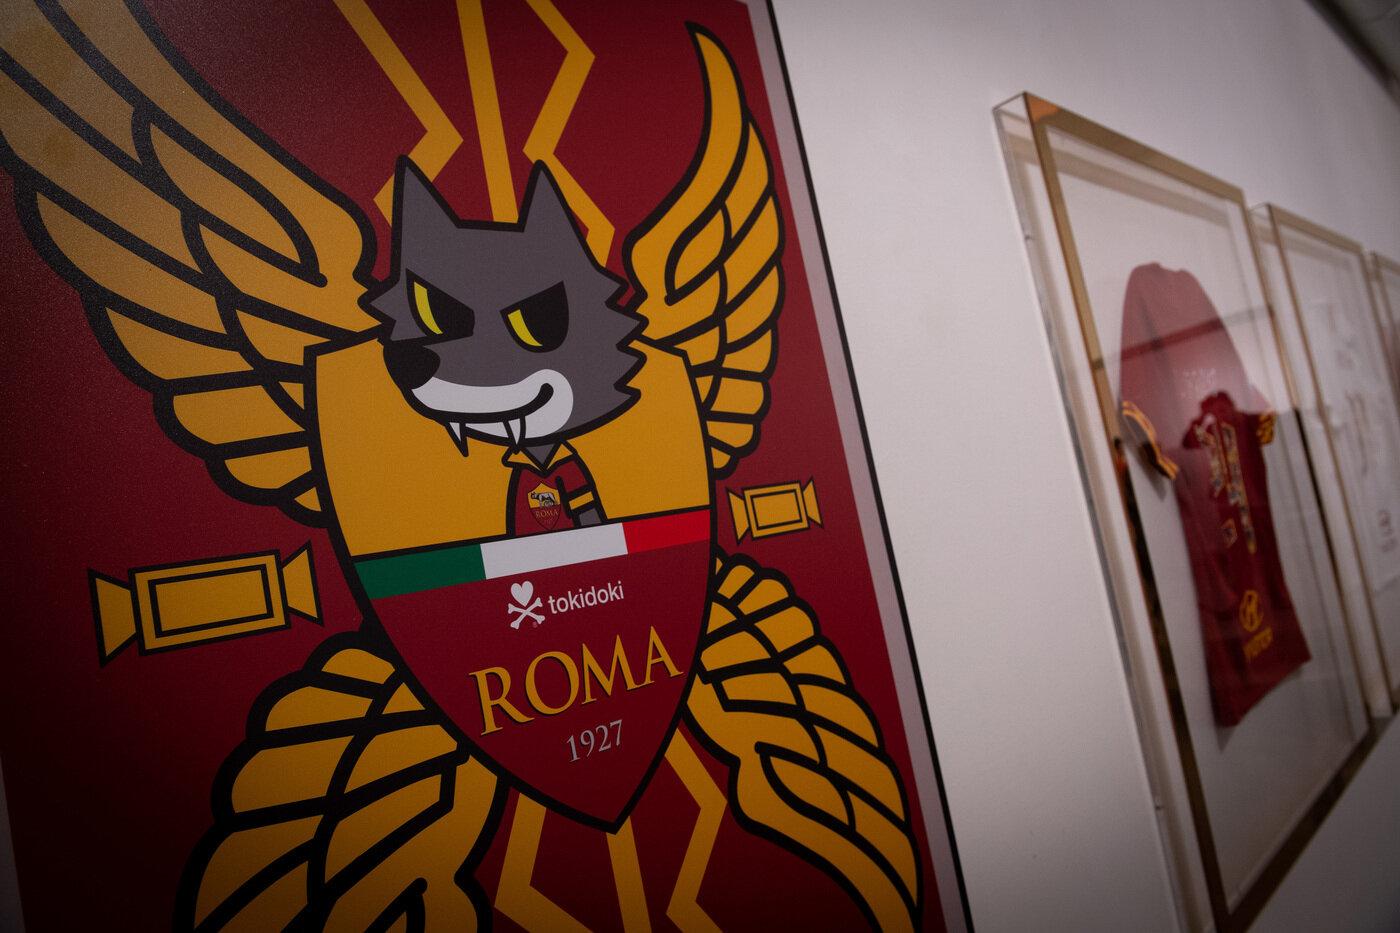 roma5.jpg